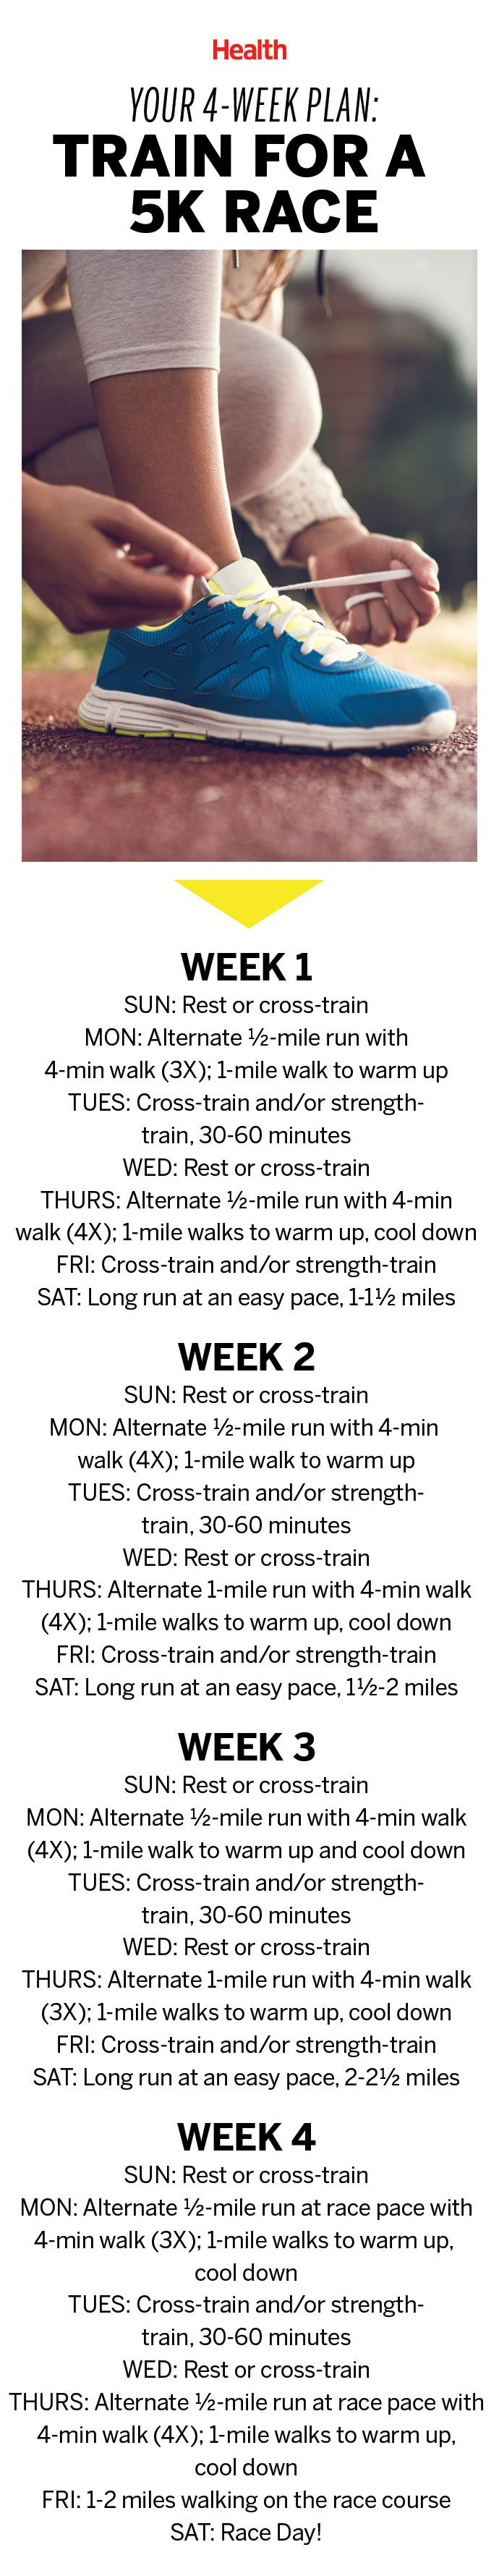 Best 5k training plan ideas on Pinterest